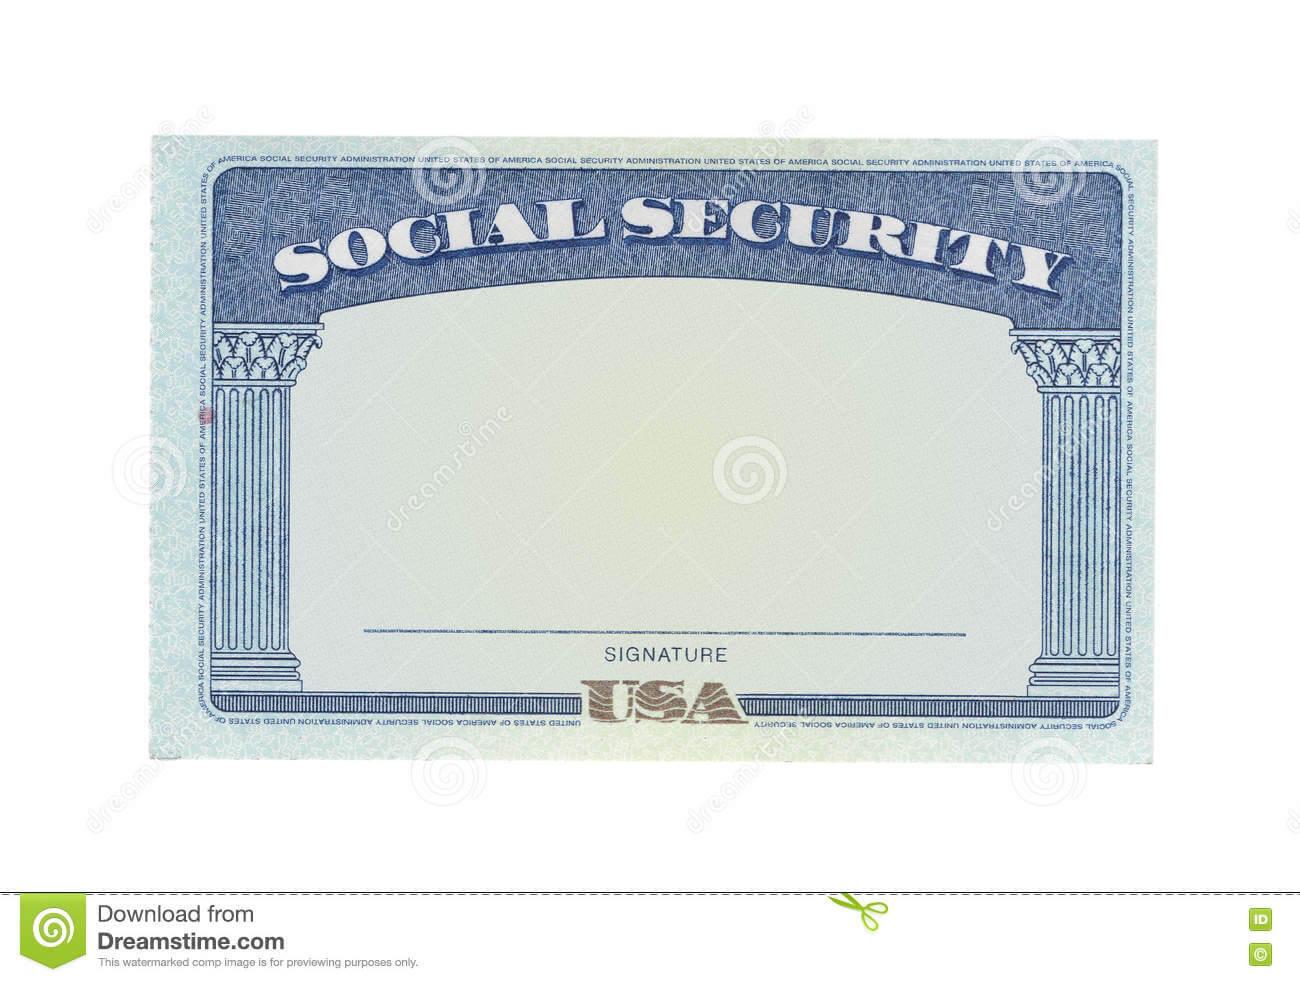 Blank Social Security Card Stock Photos - Download 127 Throughout Blank Social Security Card Template Download